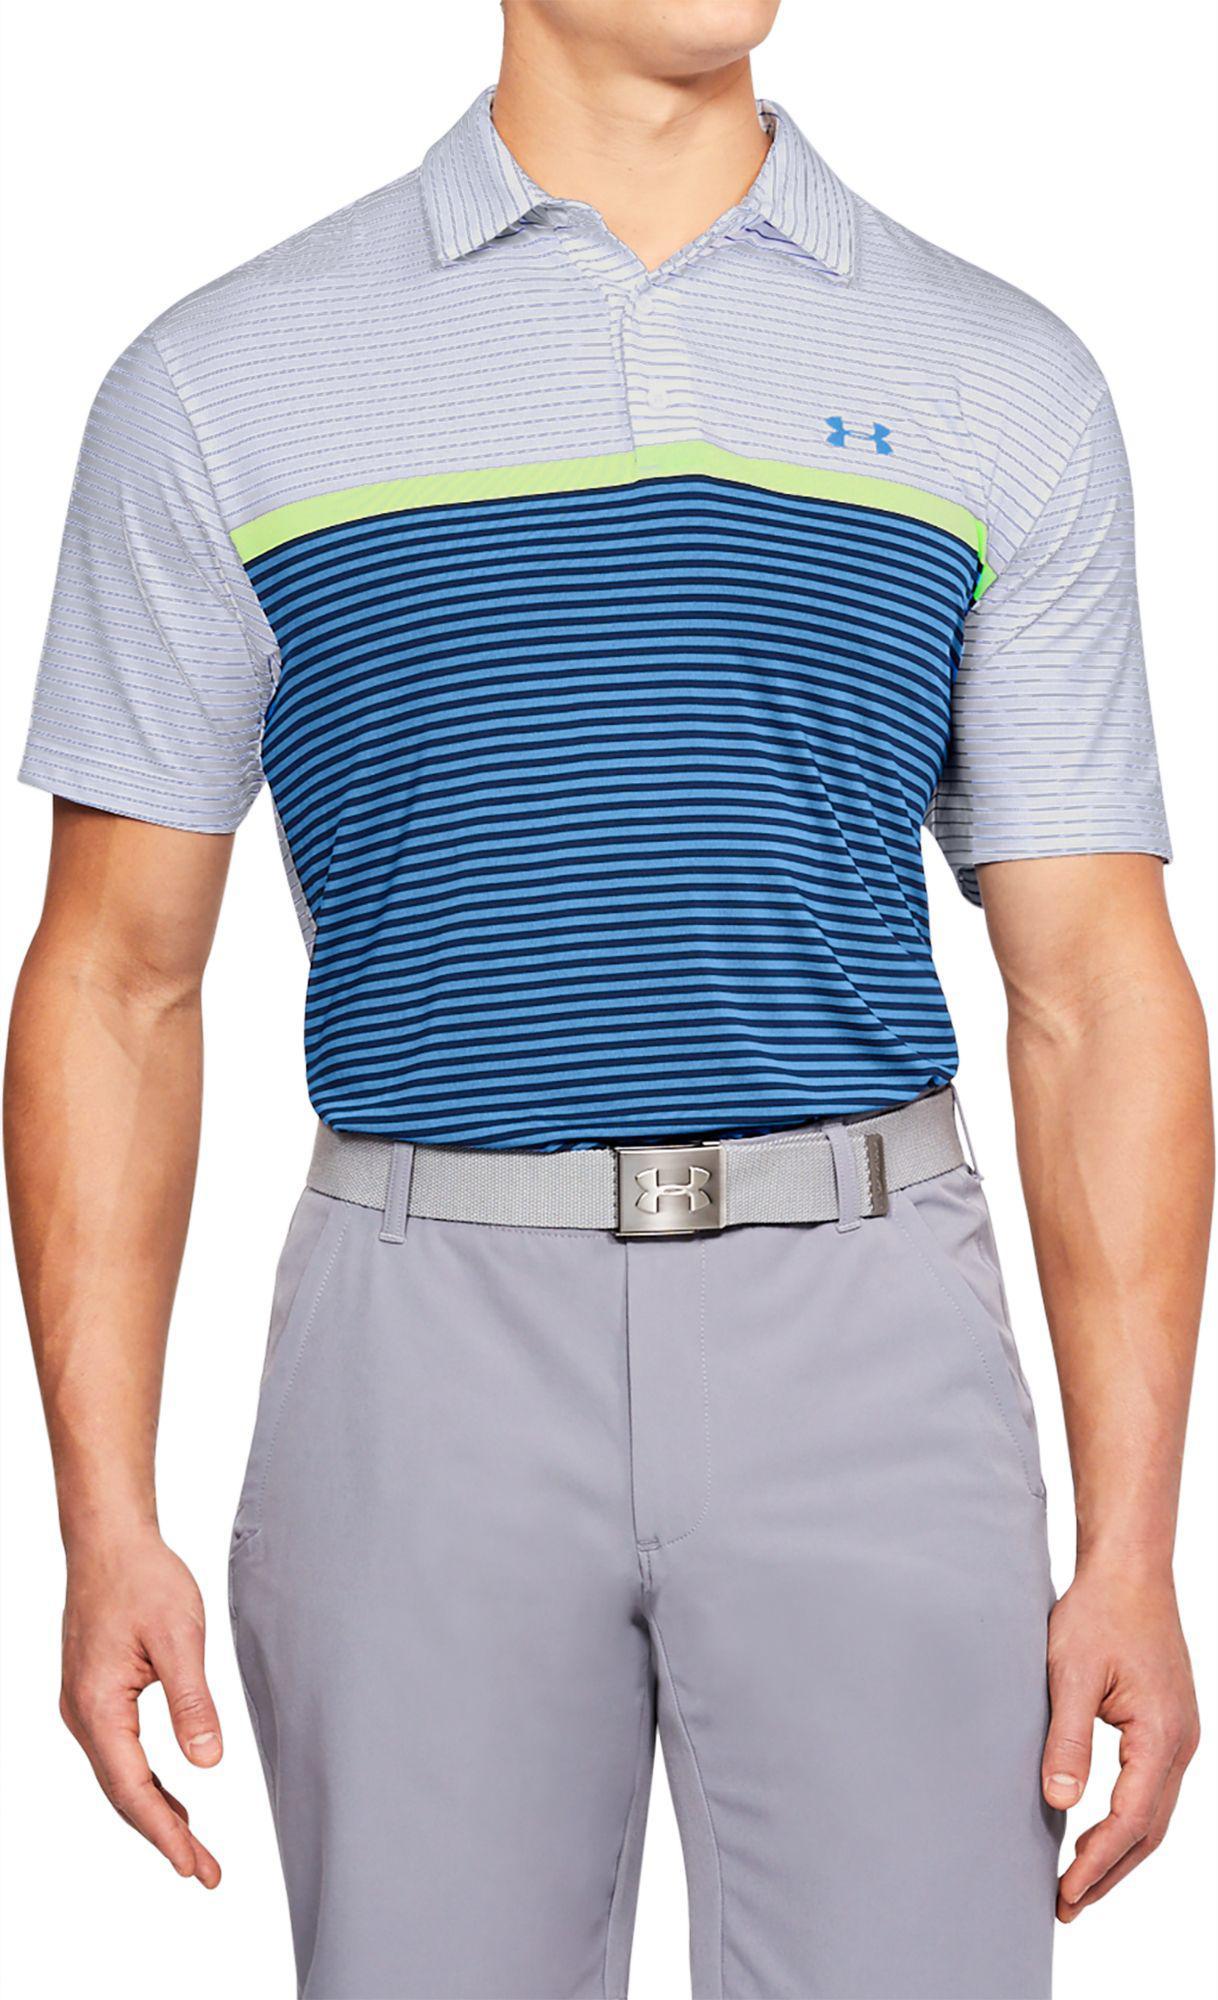 51c314b7 Under Armour Mens Playoff Super Stripe Polo Shirt